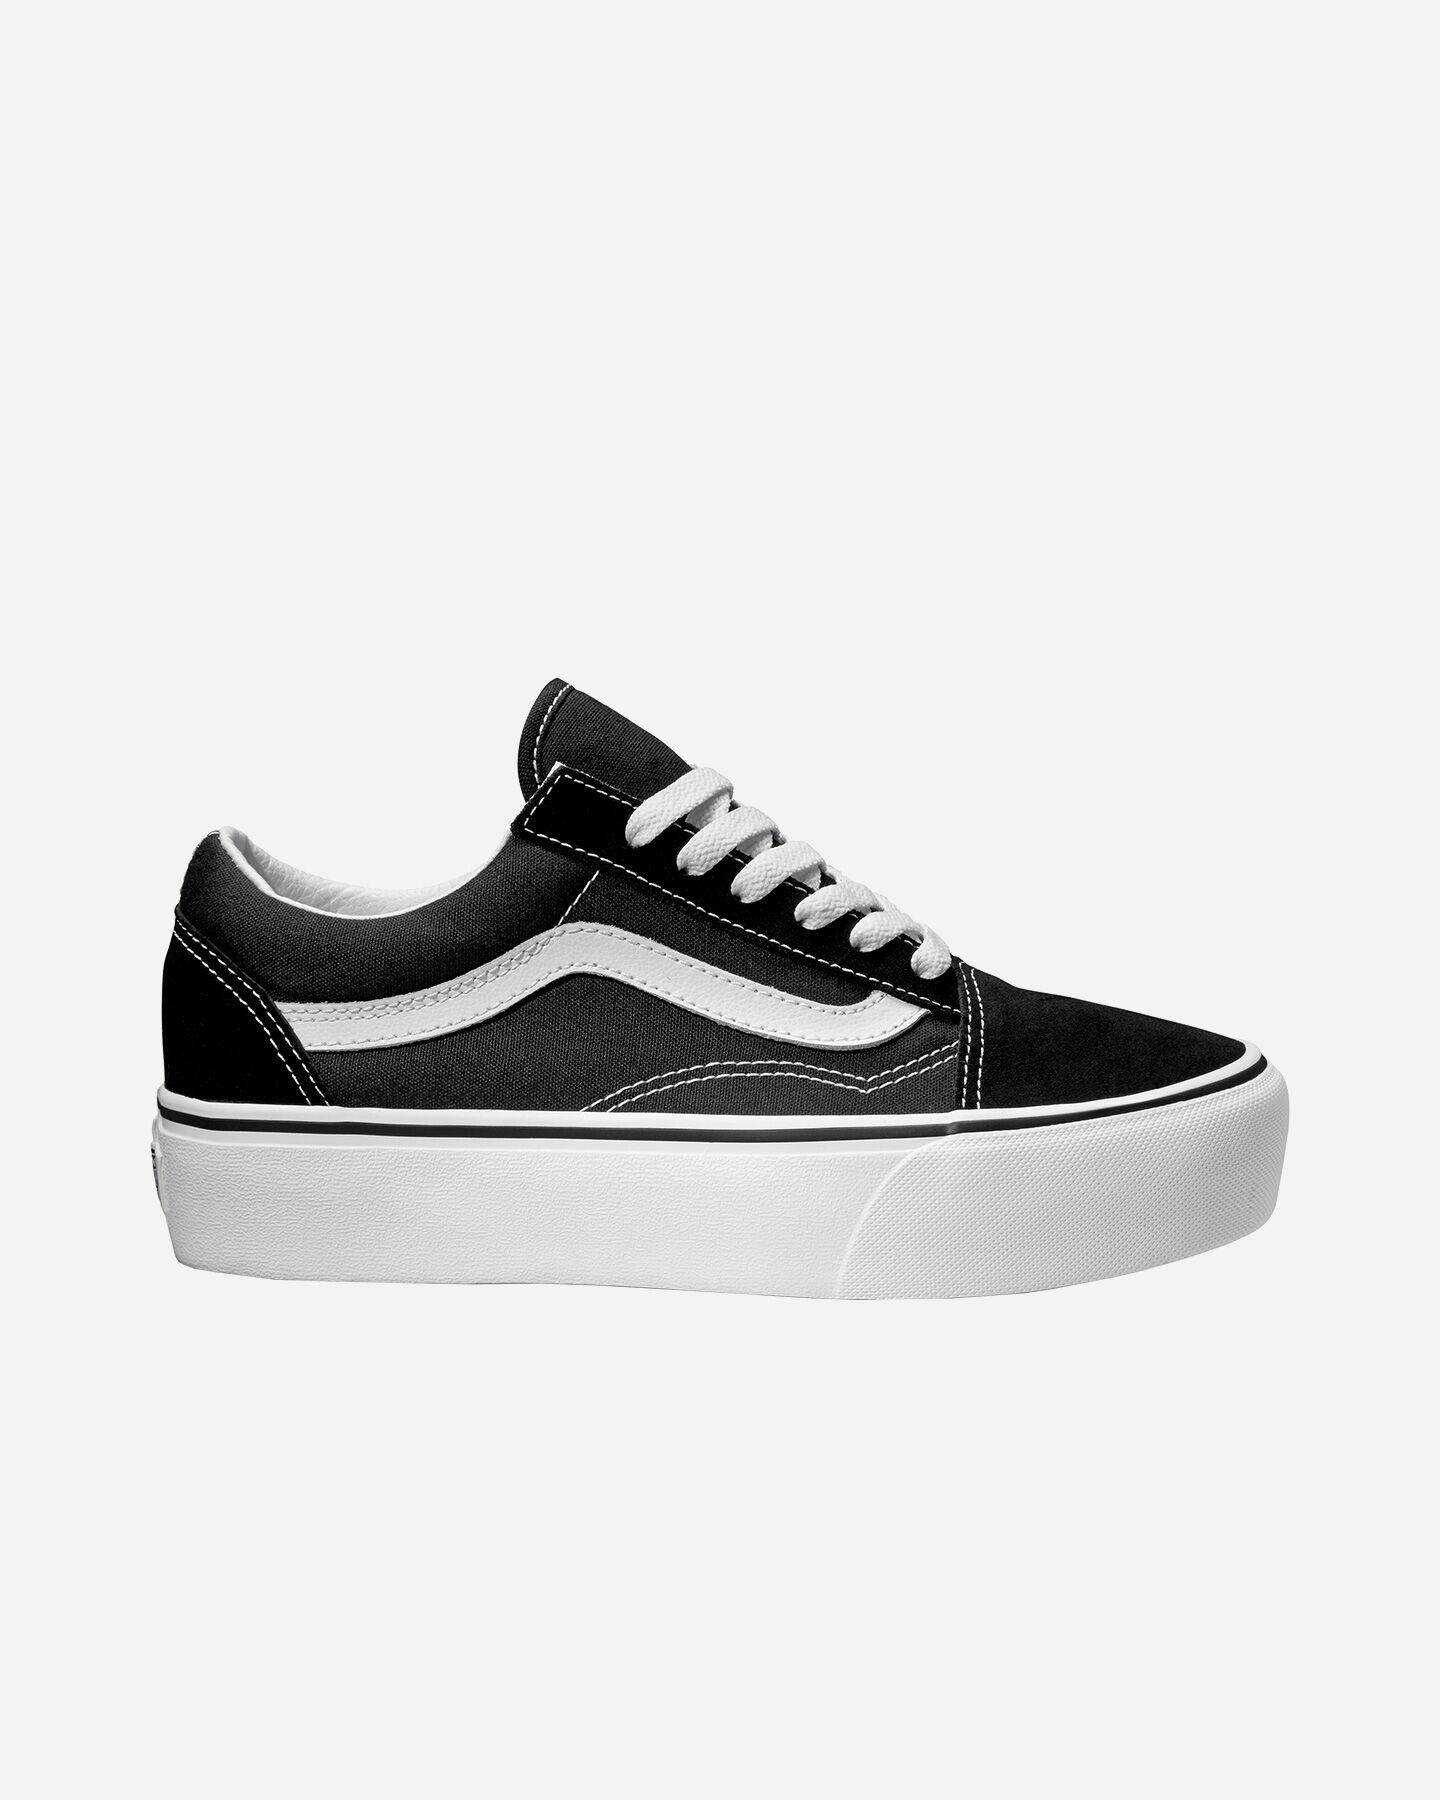 Scarpe vans scontate Outlet scarpe vans Vans UomoDonna Scarpe